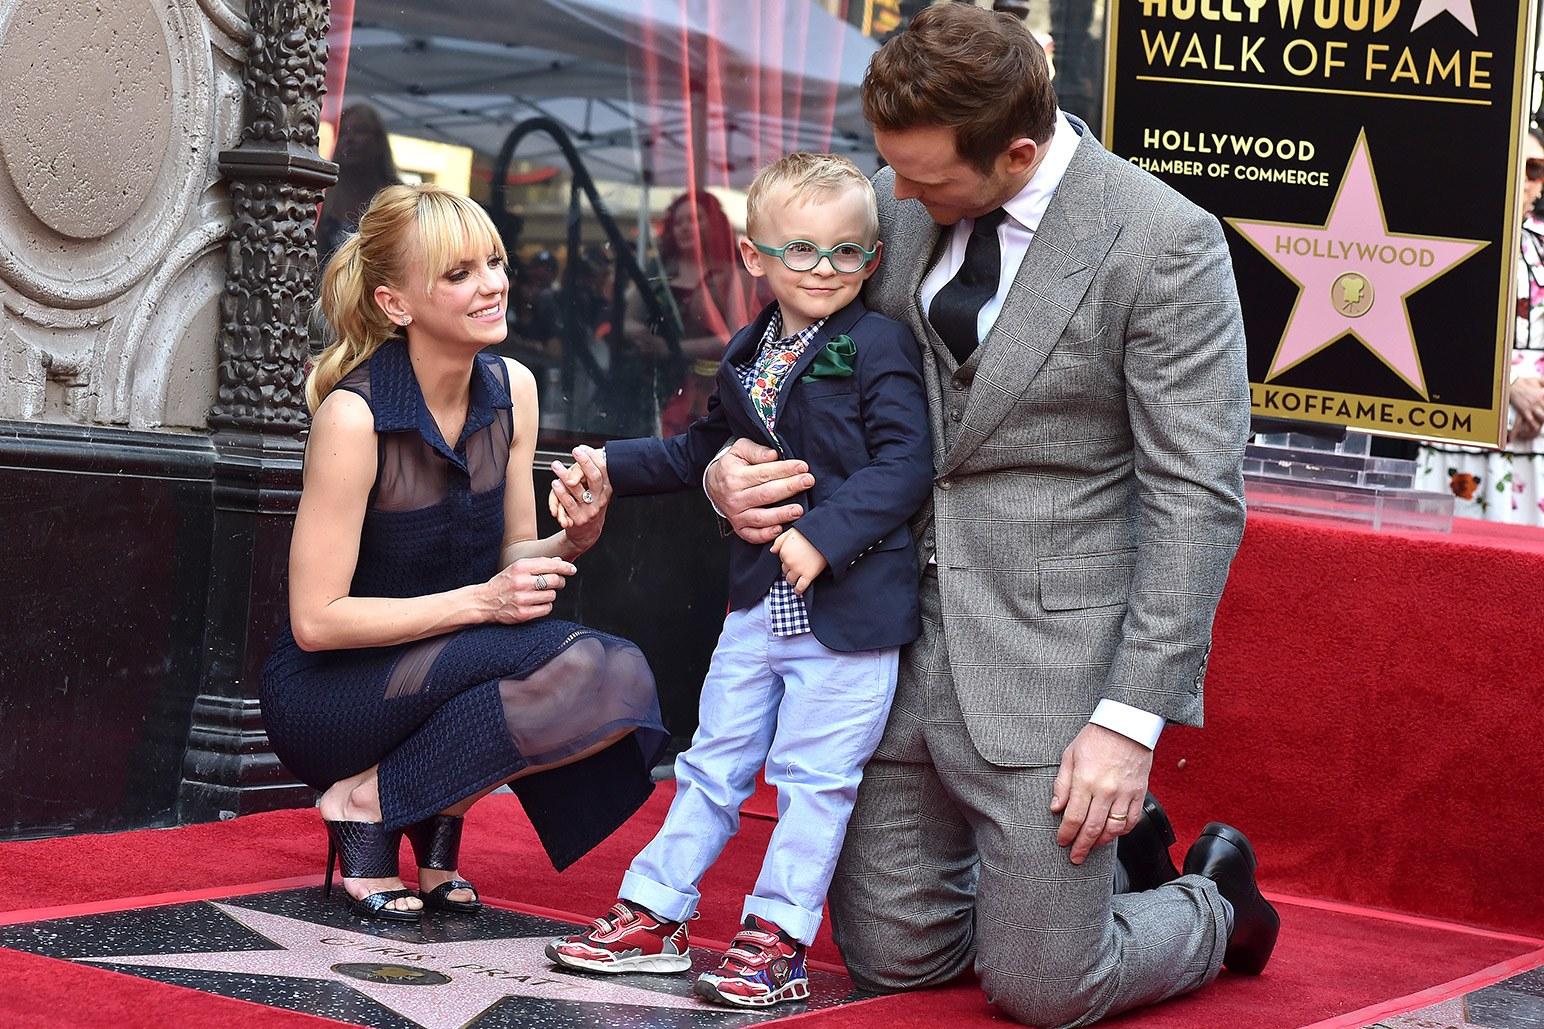 Chris Pratt & Anna Faris